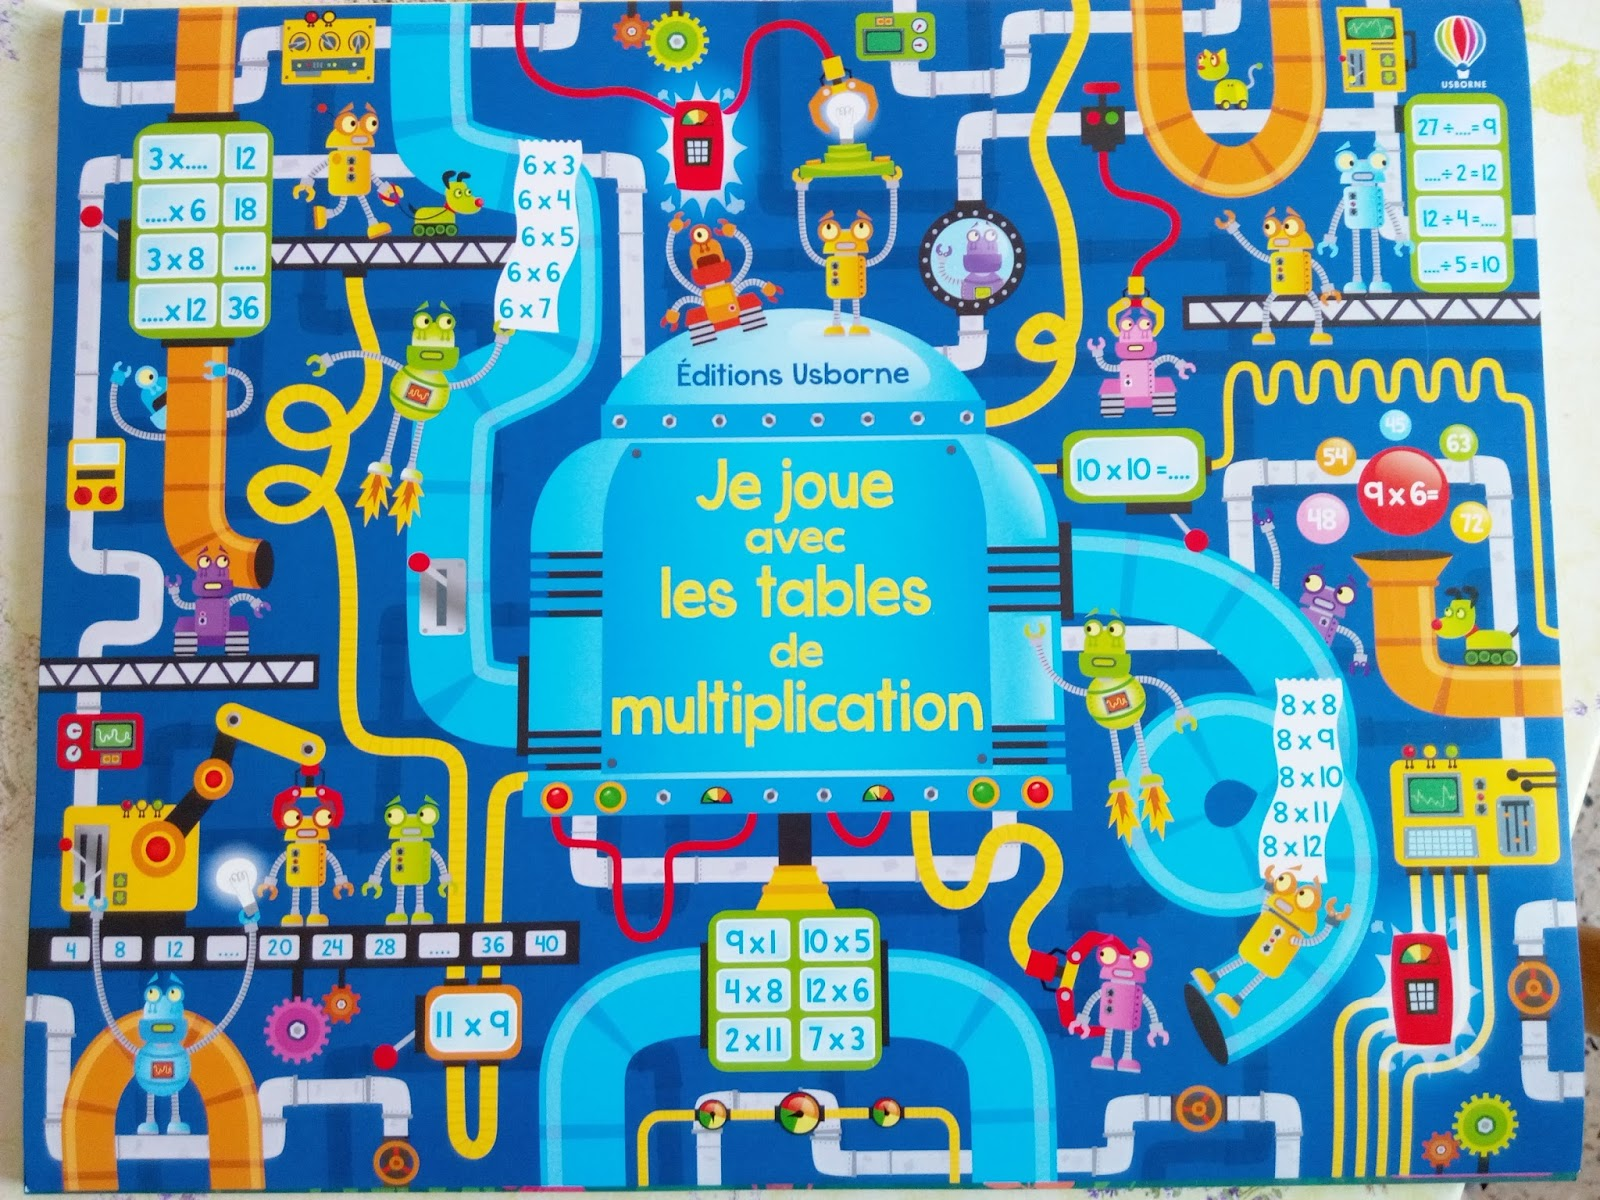 Ma tribu de jumeaux apprendre les multiplications tout for Apprendre les tables de multiplications en jouant